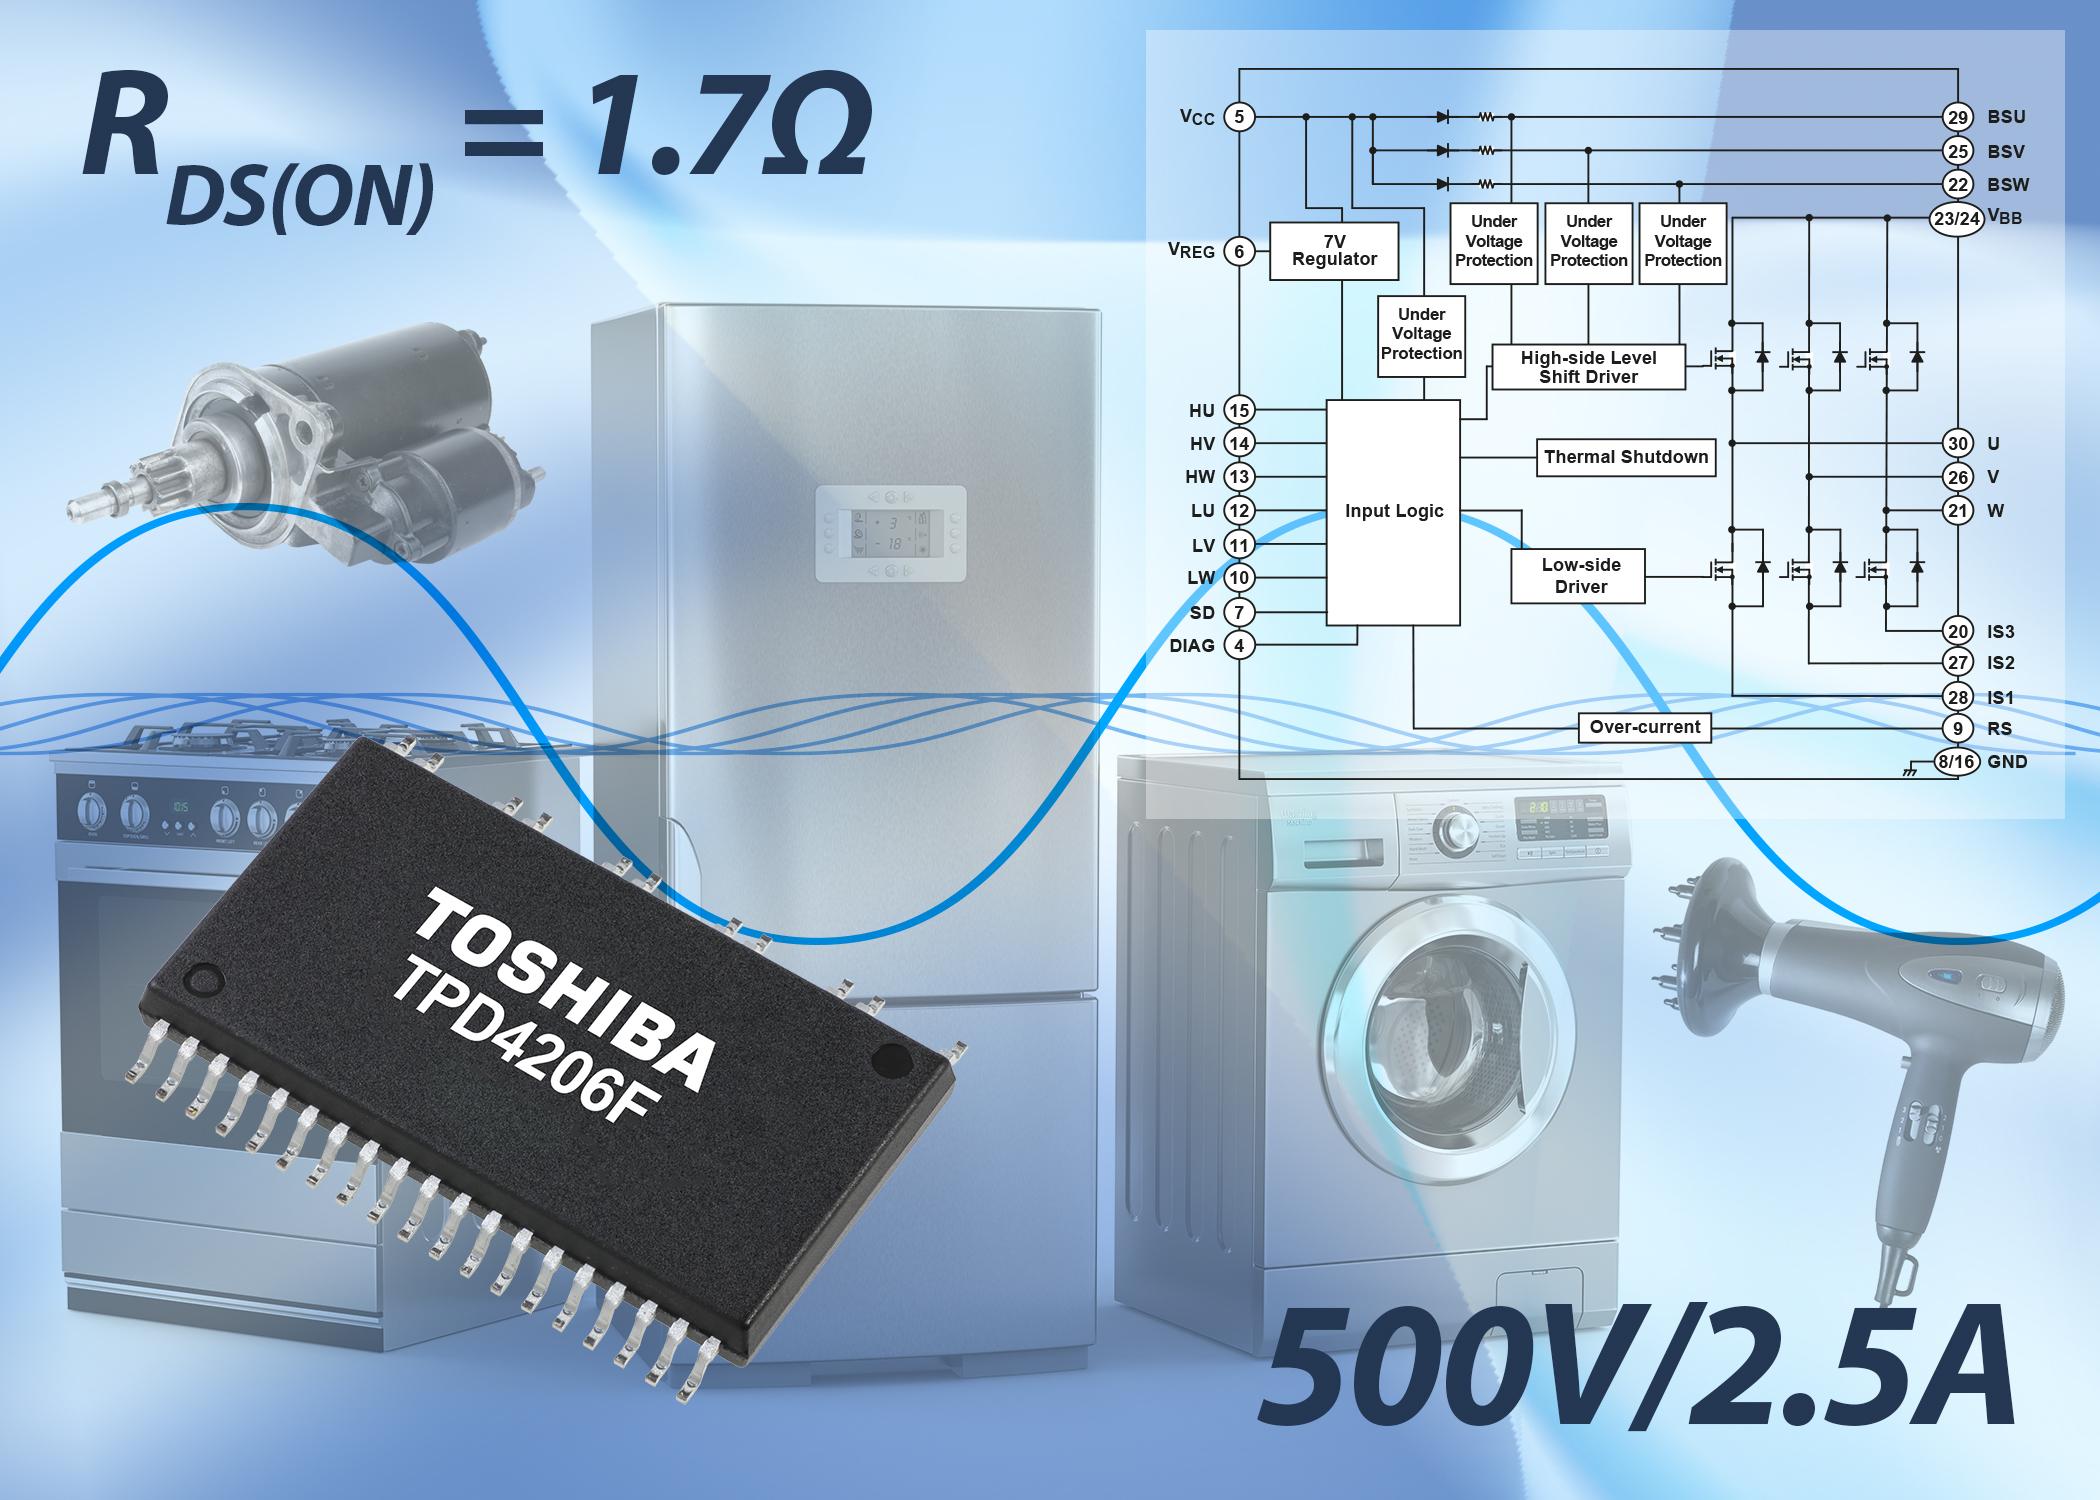 Toshiba_TPD4206F.jpg